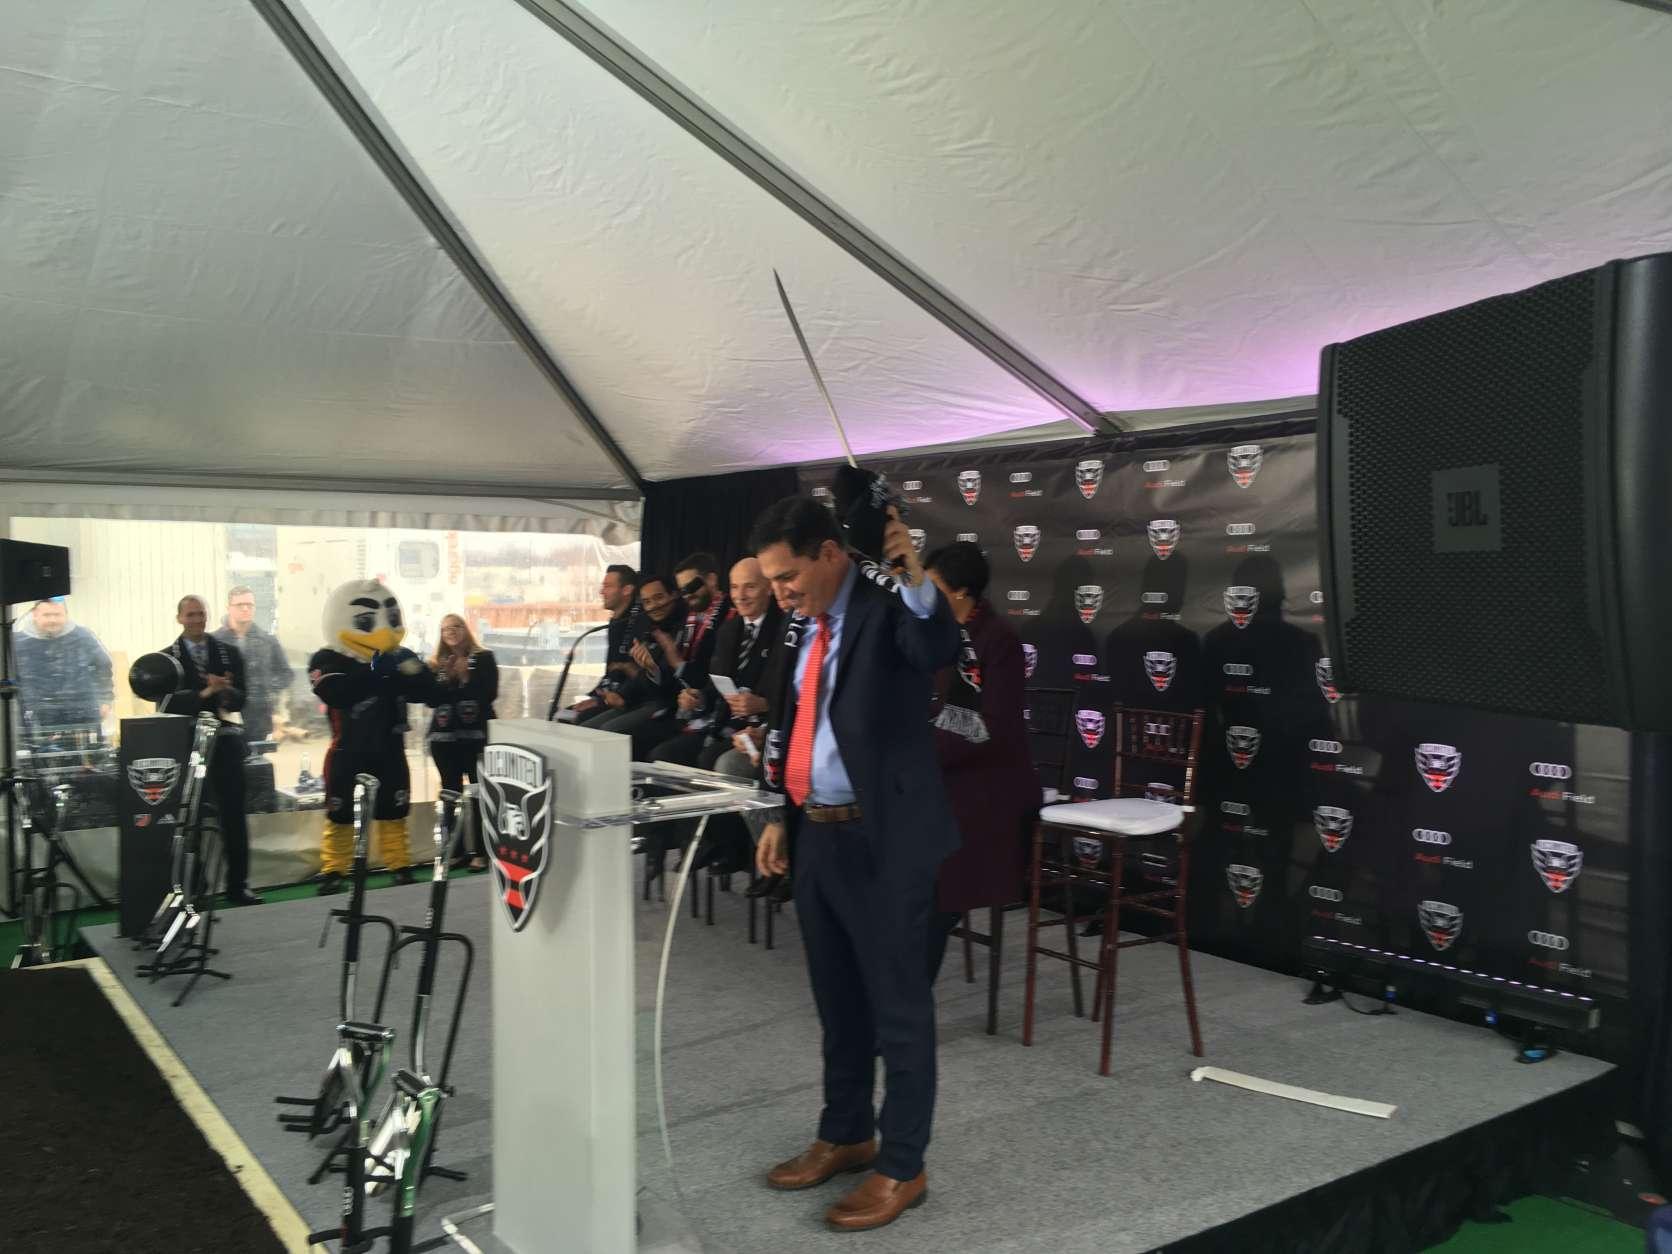 D.C. United Managing General Partner Jason Levien holds up a machete at the Audi Field groundbreaking. (WTOP/Noah Frank)